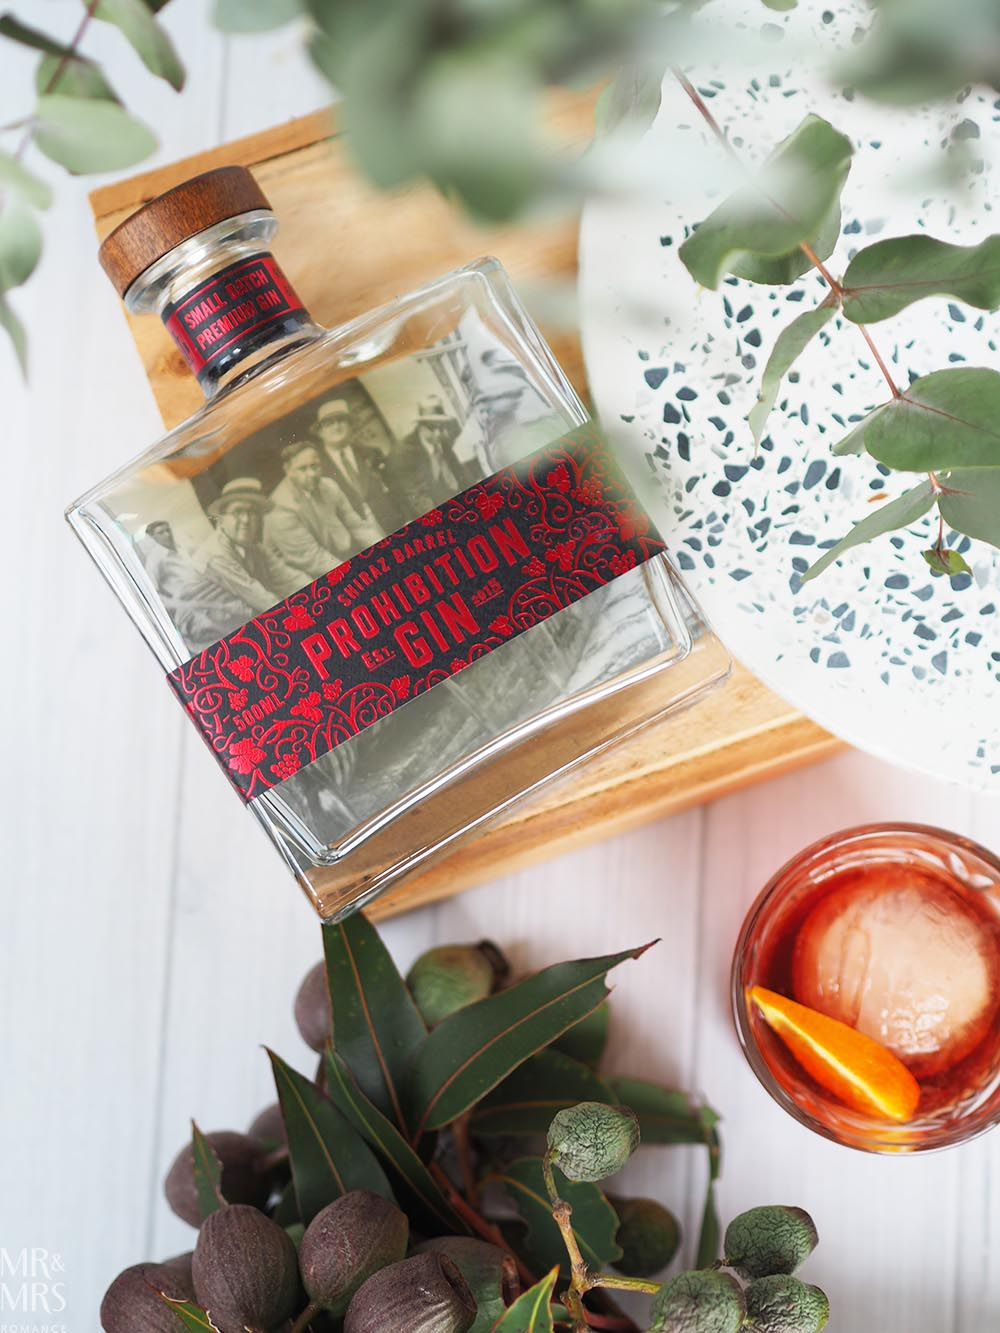 Negroni cocktail Prohibition Shiraz Barrel Aged gin